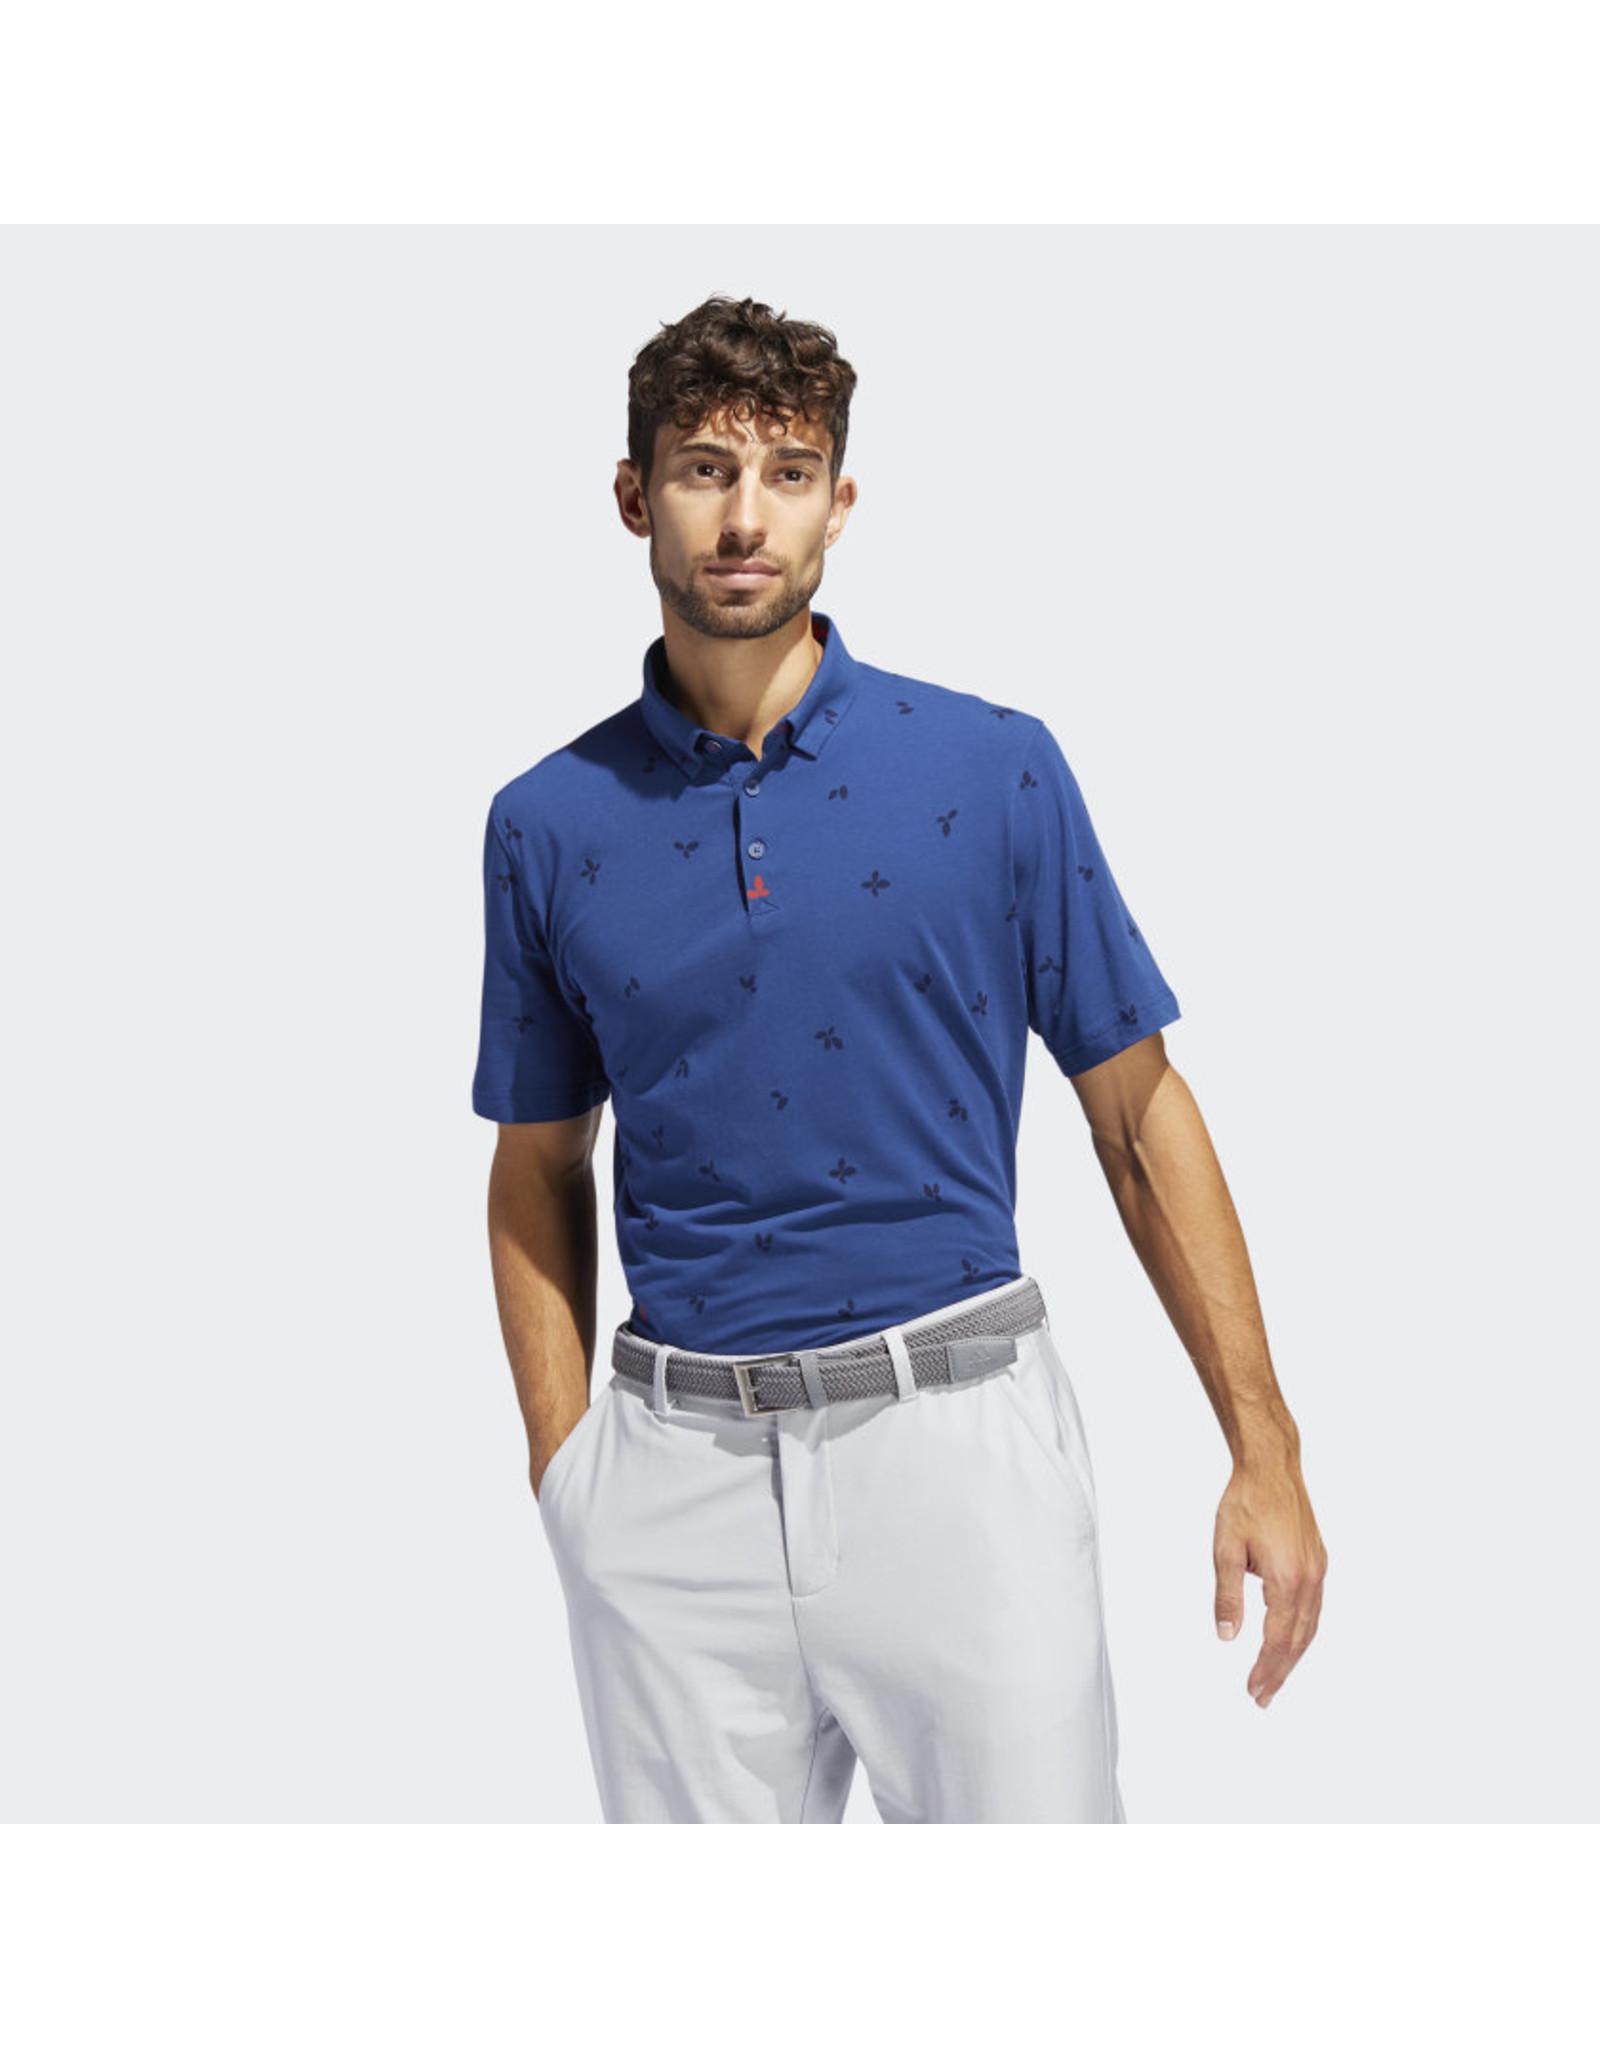 Adidas Shirt Adipure NVTY